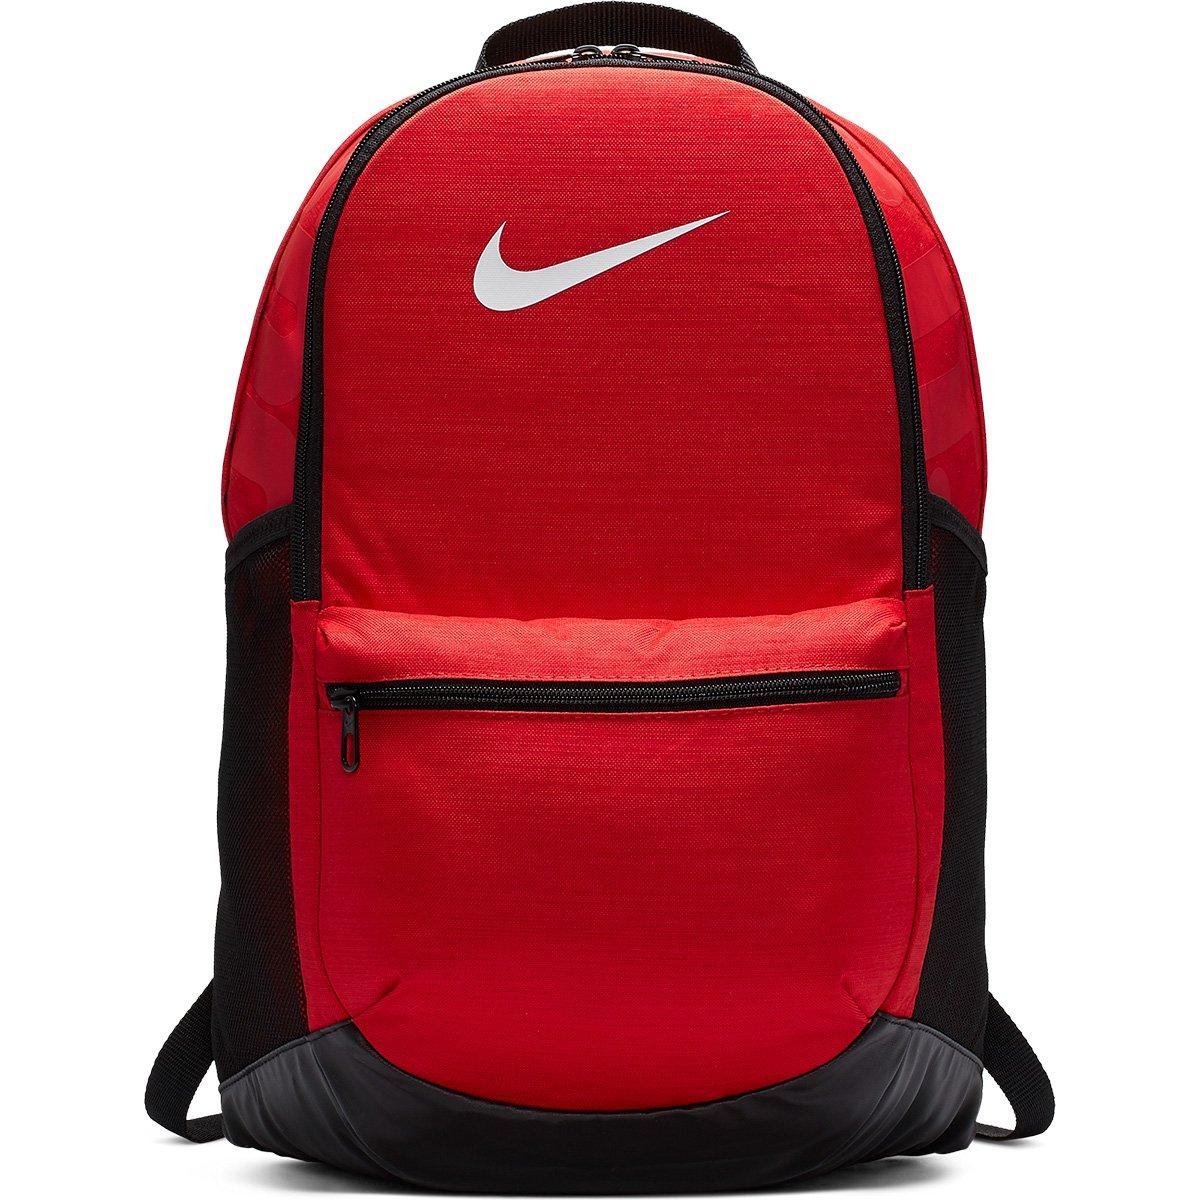 9a52804fe Mochila Nike Brasília - Vermelho e Preto | Loja do Inter